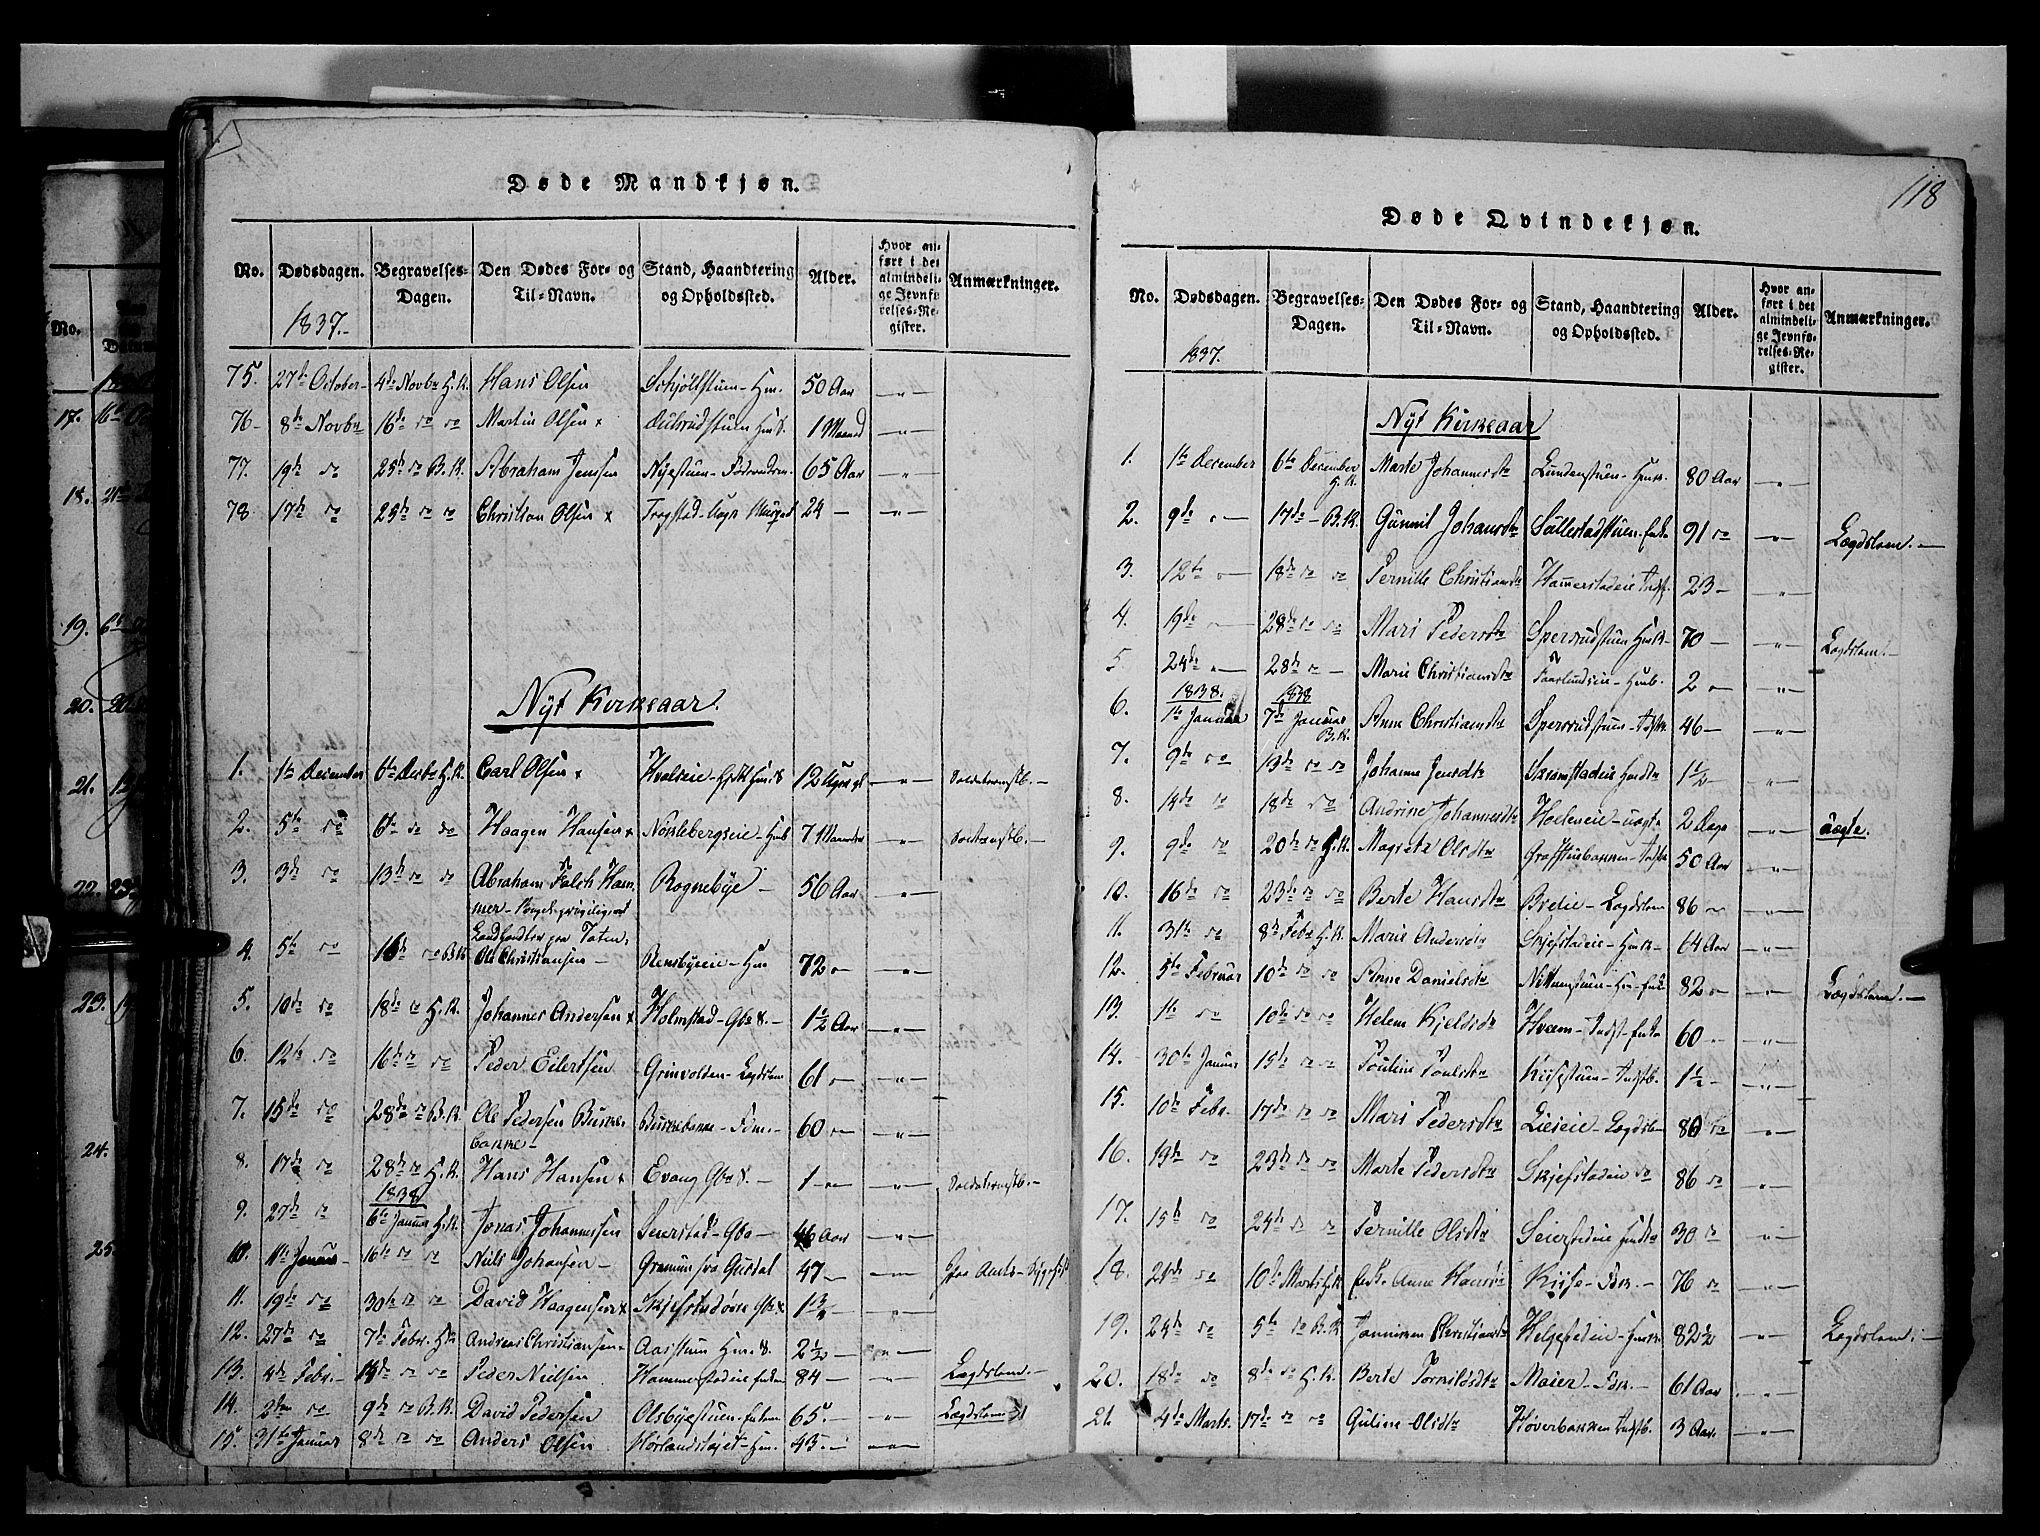 SAH, Østre Toten prestekontor, Ministerialbok nr. 1, 1828-1839, s. 118